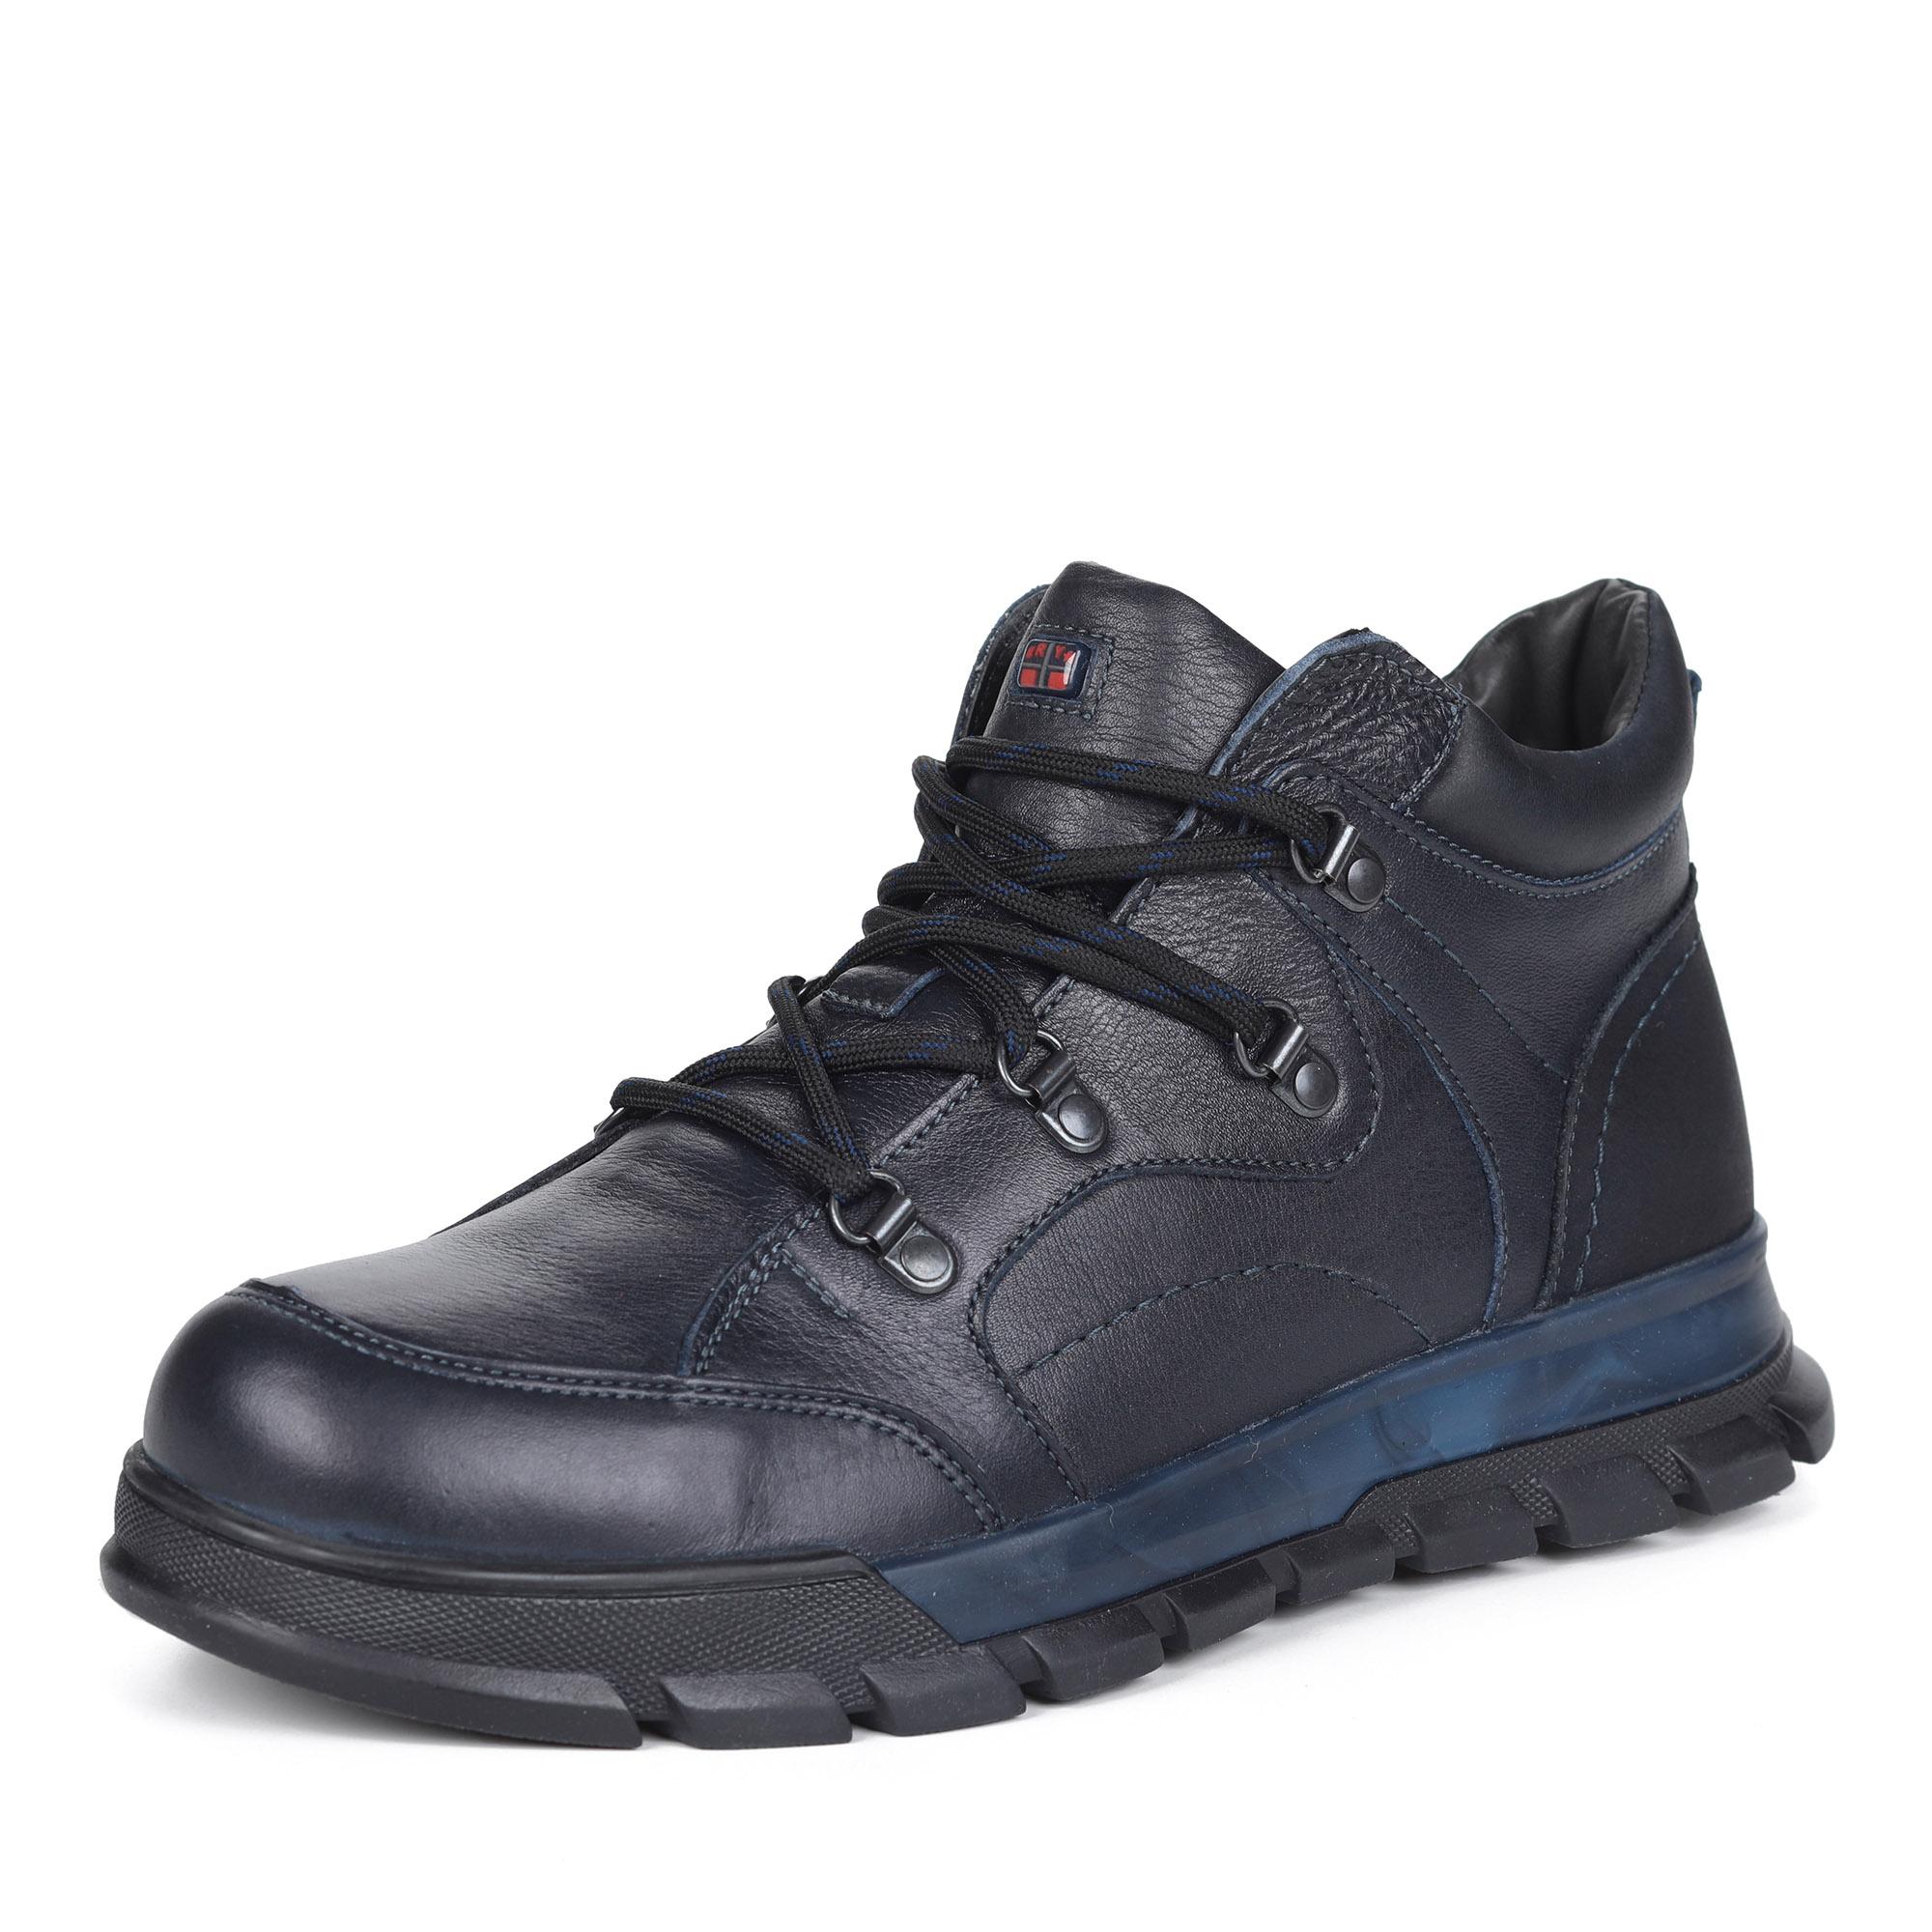 Синие ботинки из кожи на шерсти